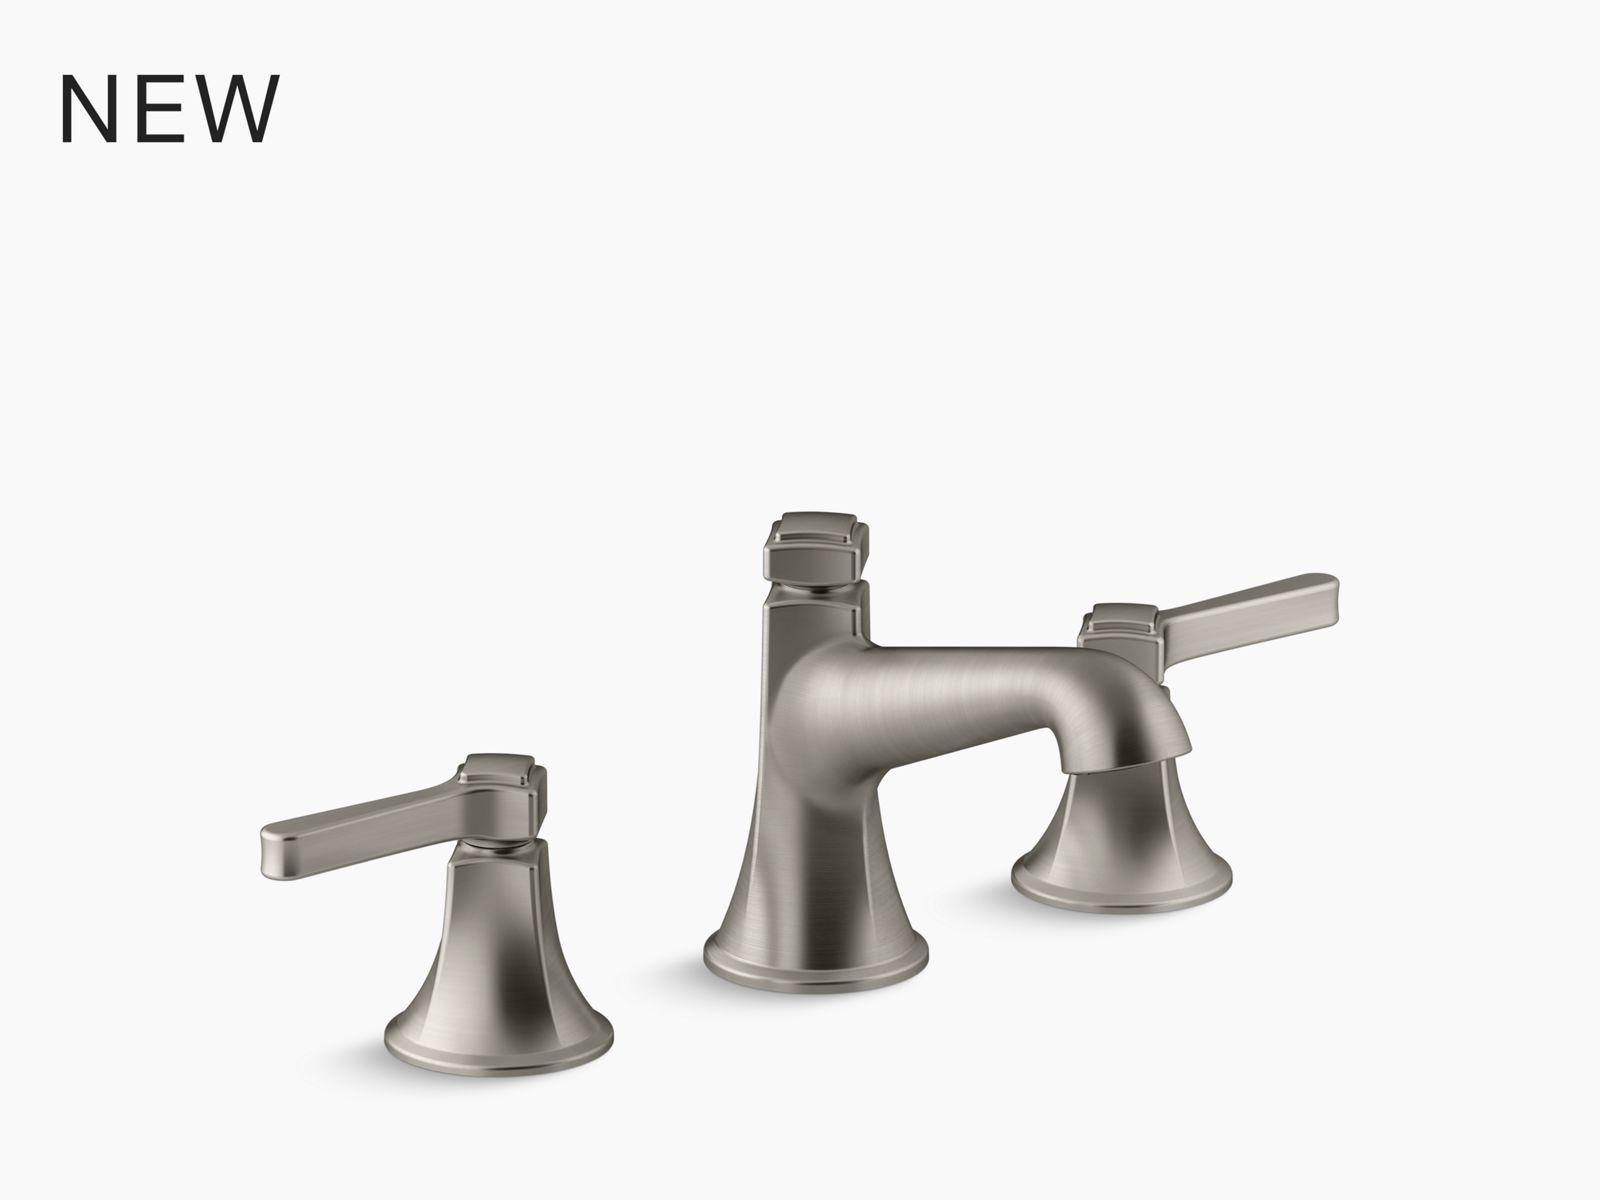 vault 35 1 2 x 21 1 4 x 9 5 16 undermount single bowl farmhouse kitchen sink for 36 cabinet